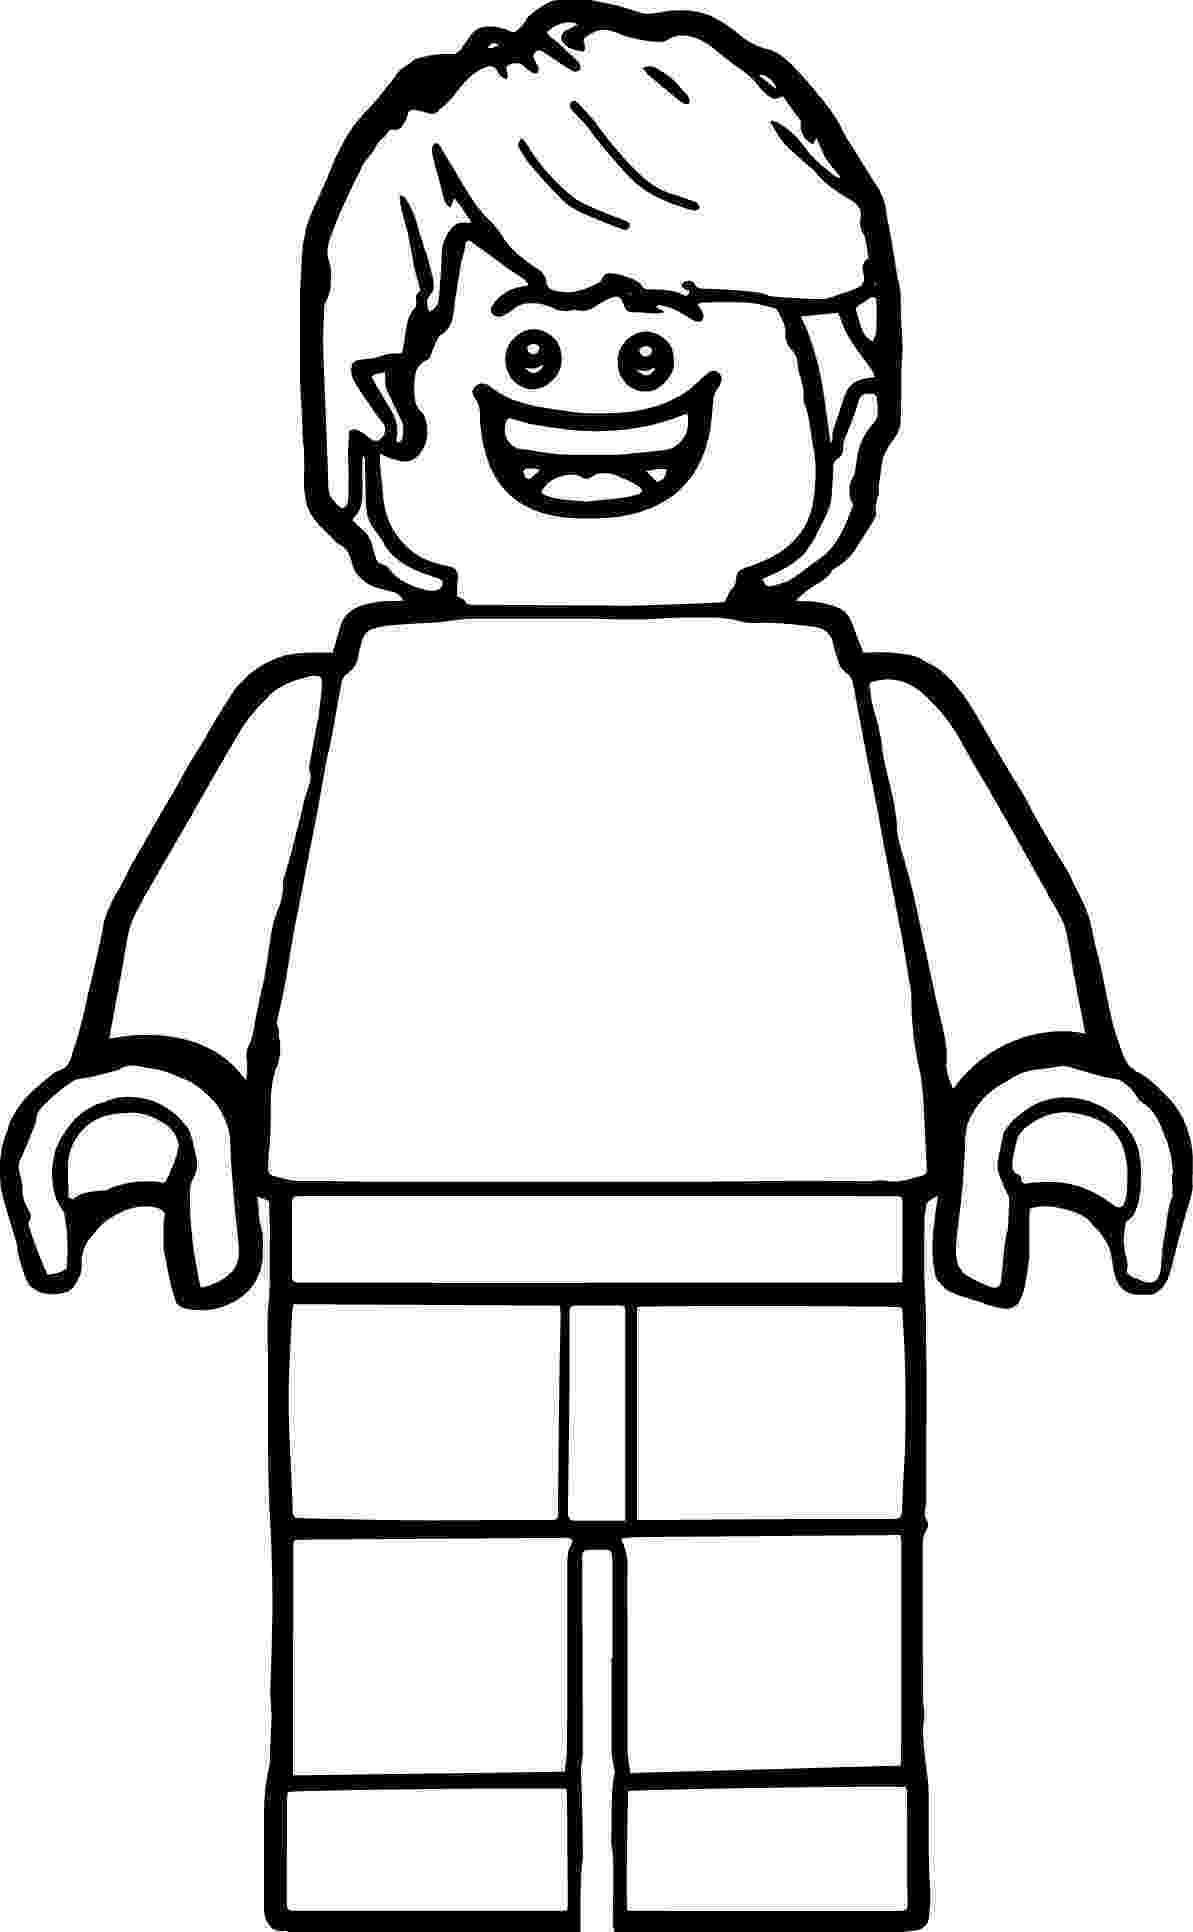 lego man printable printable lego party game my sister39s suitcase packed lego man printable